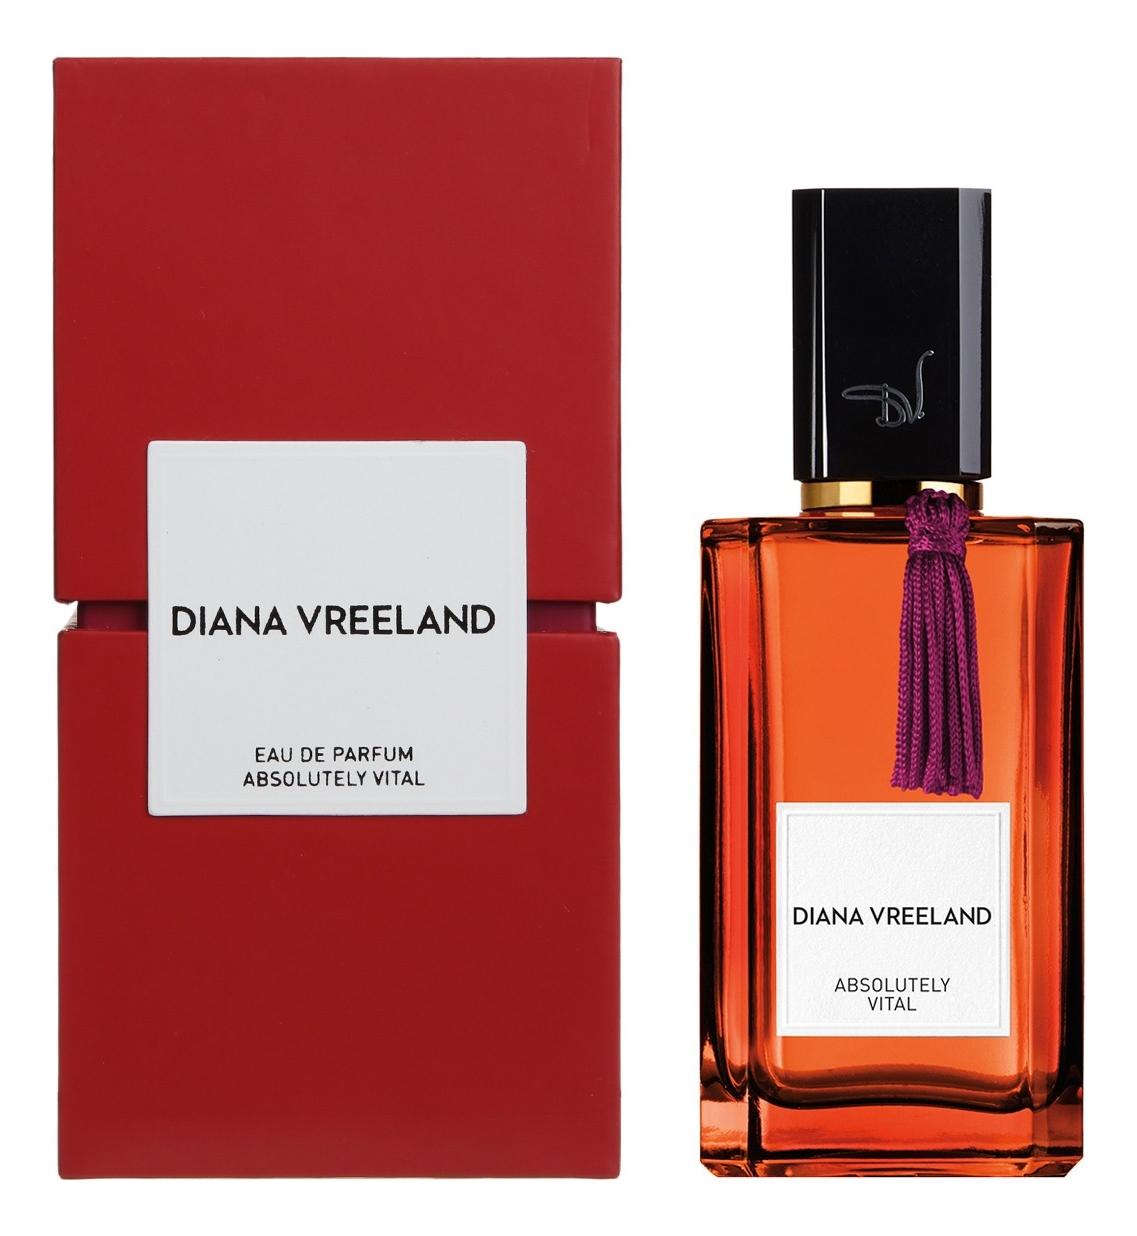 Diana Vreeland Absolutely Vital : парфюмерная вода 100мл diana vreeland simply divine туалетные духи 50 мл